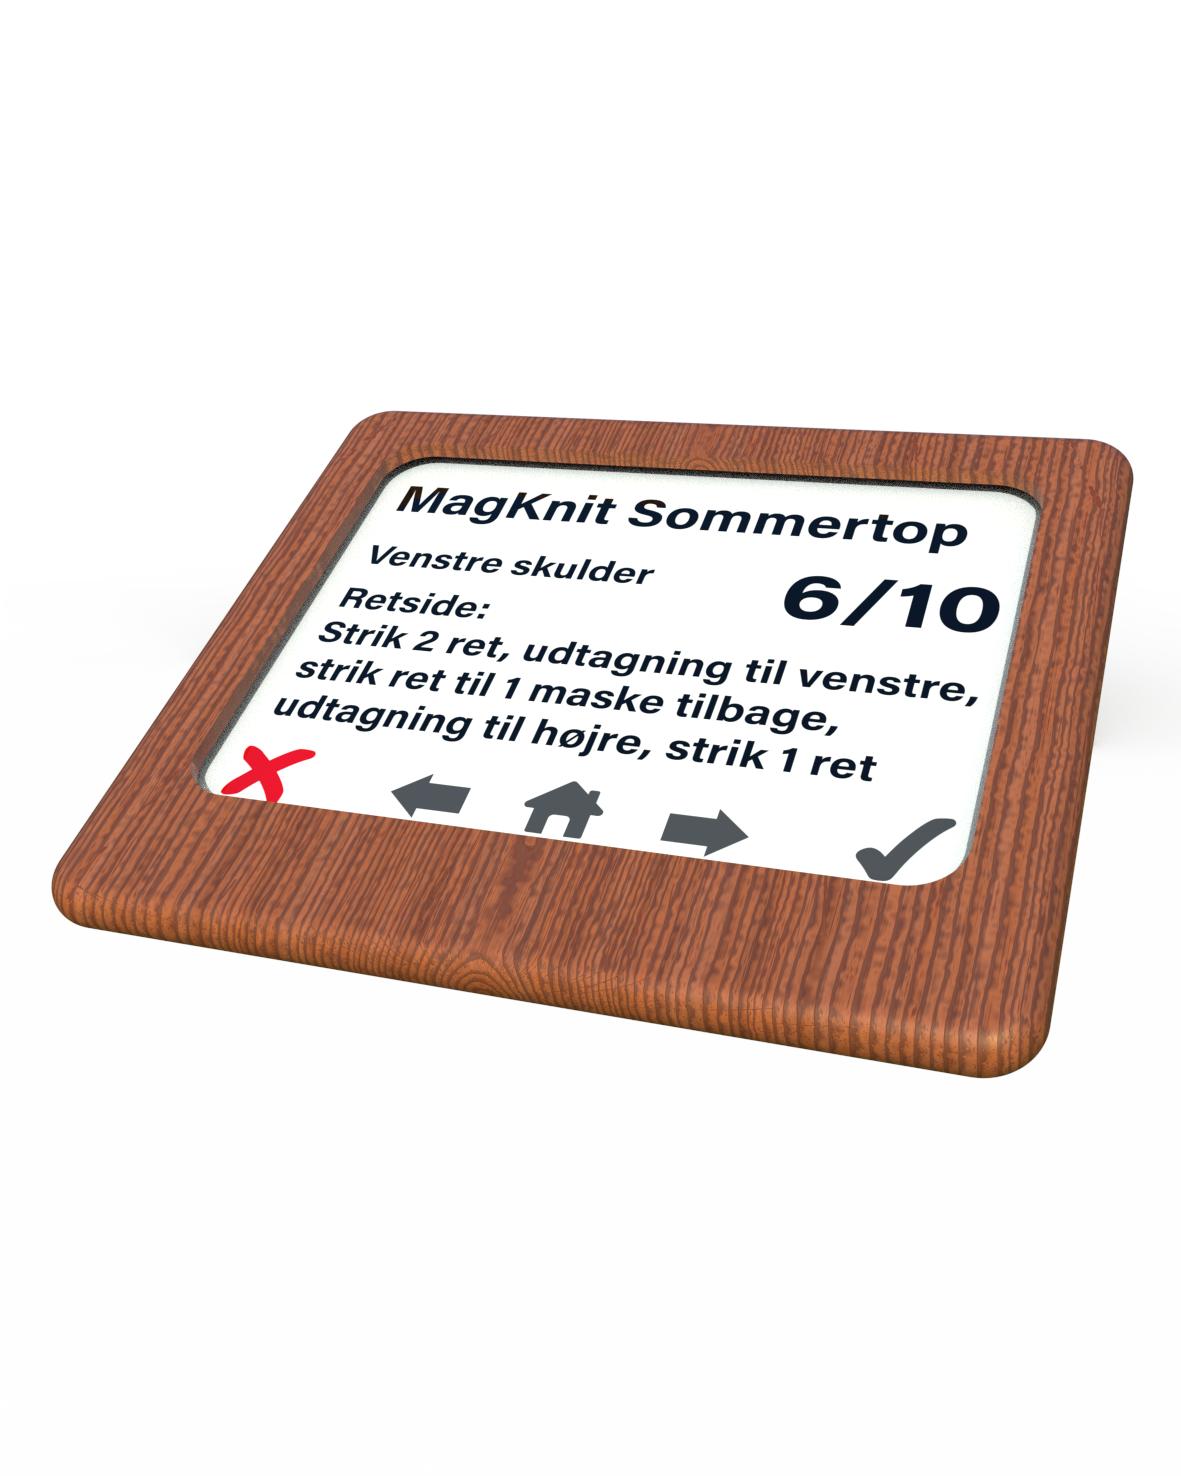 https://magknit.dk/wp-content/uploads/2021/09/magknit-display.png